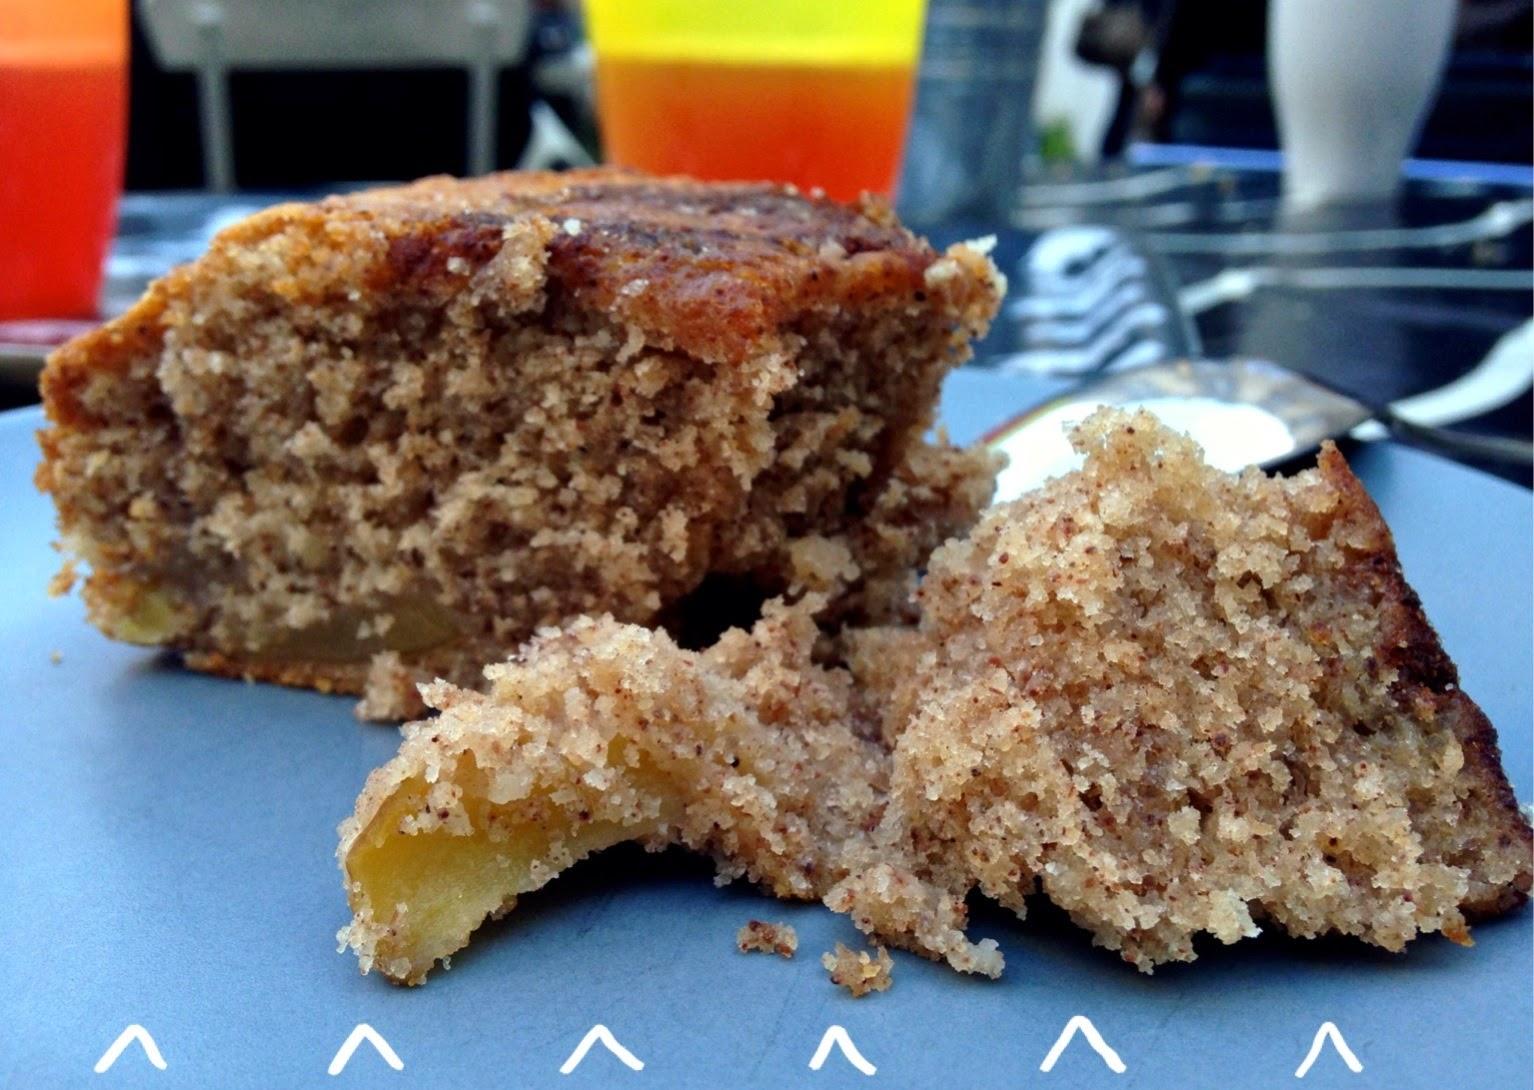 So Sweet Café Suédois Institut Suédois Miam Home Made Fait Maison Goûter Cake